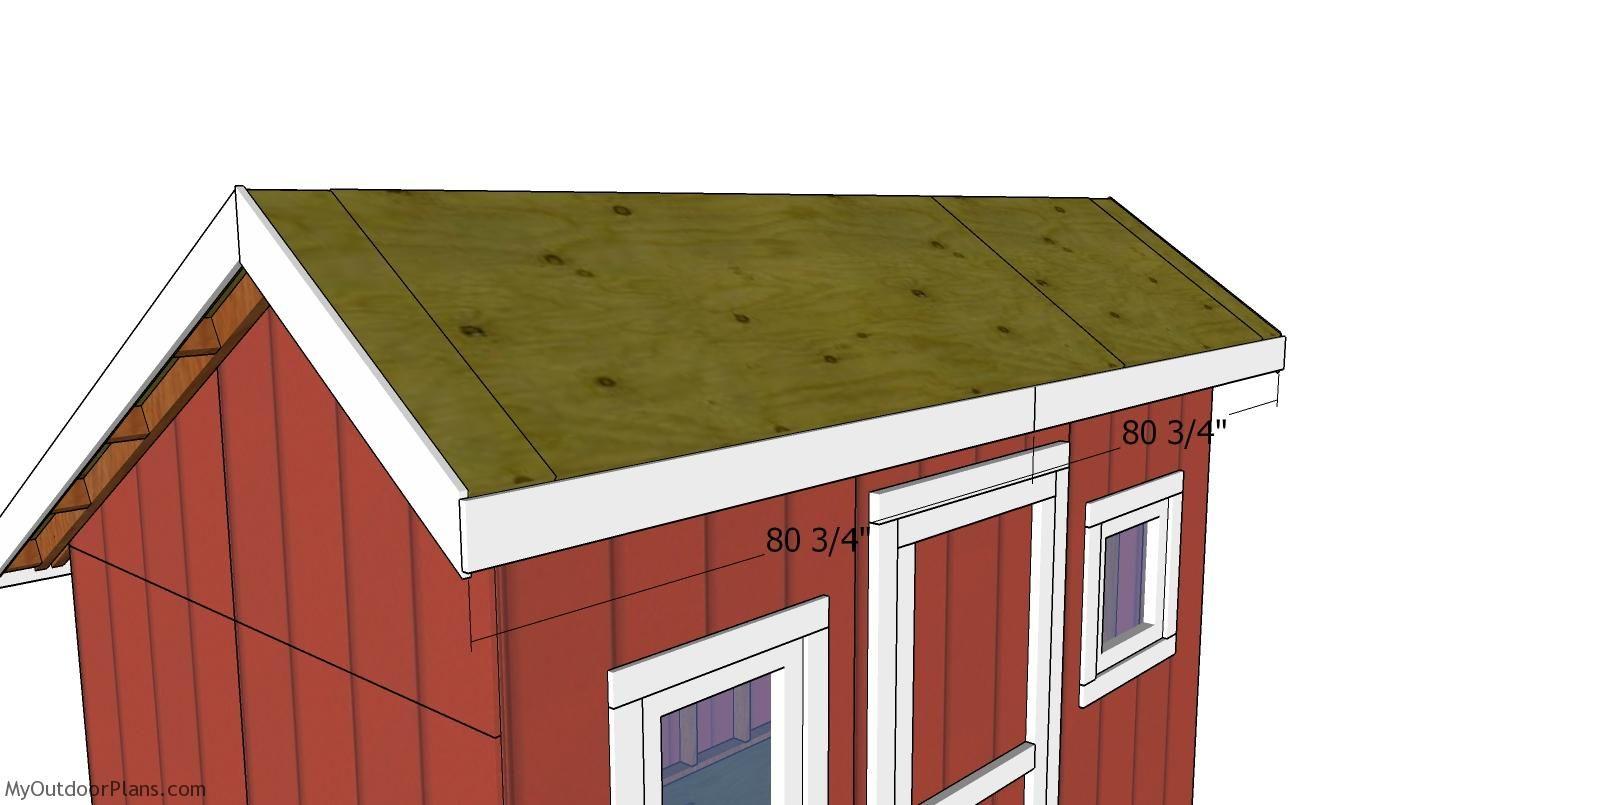 8x12 Saltbox Shed Roof Plans MyOutdoorPlans Free